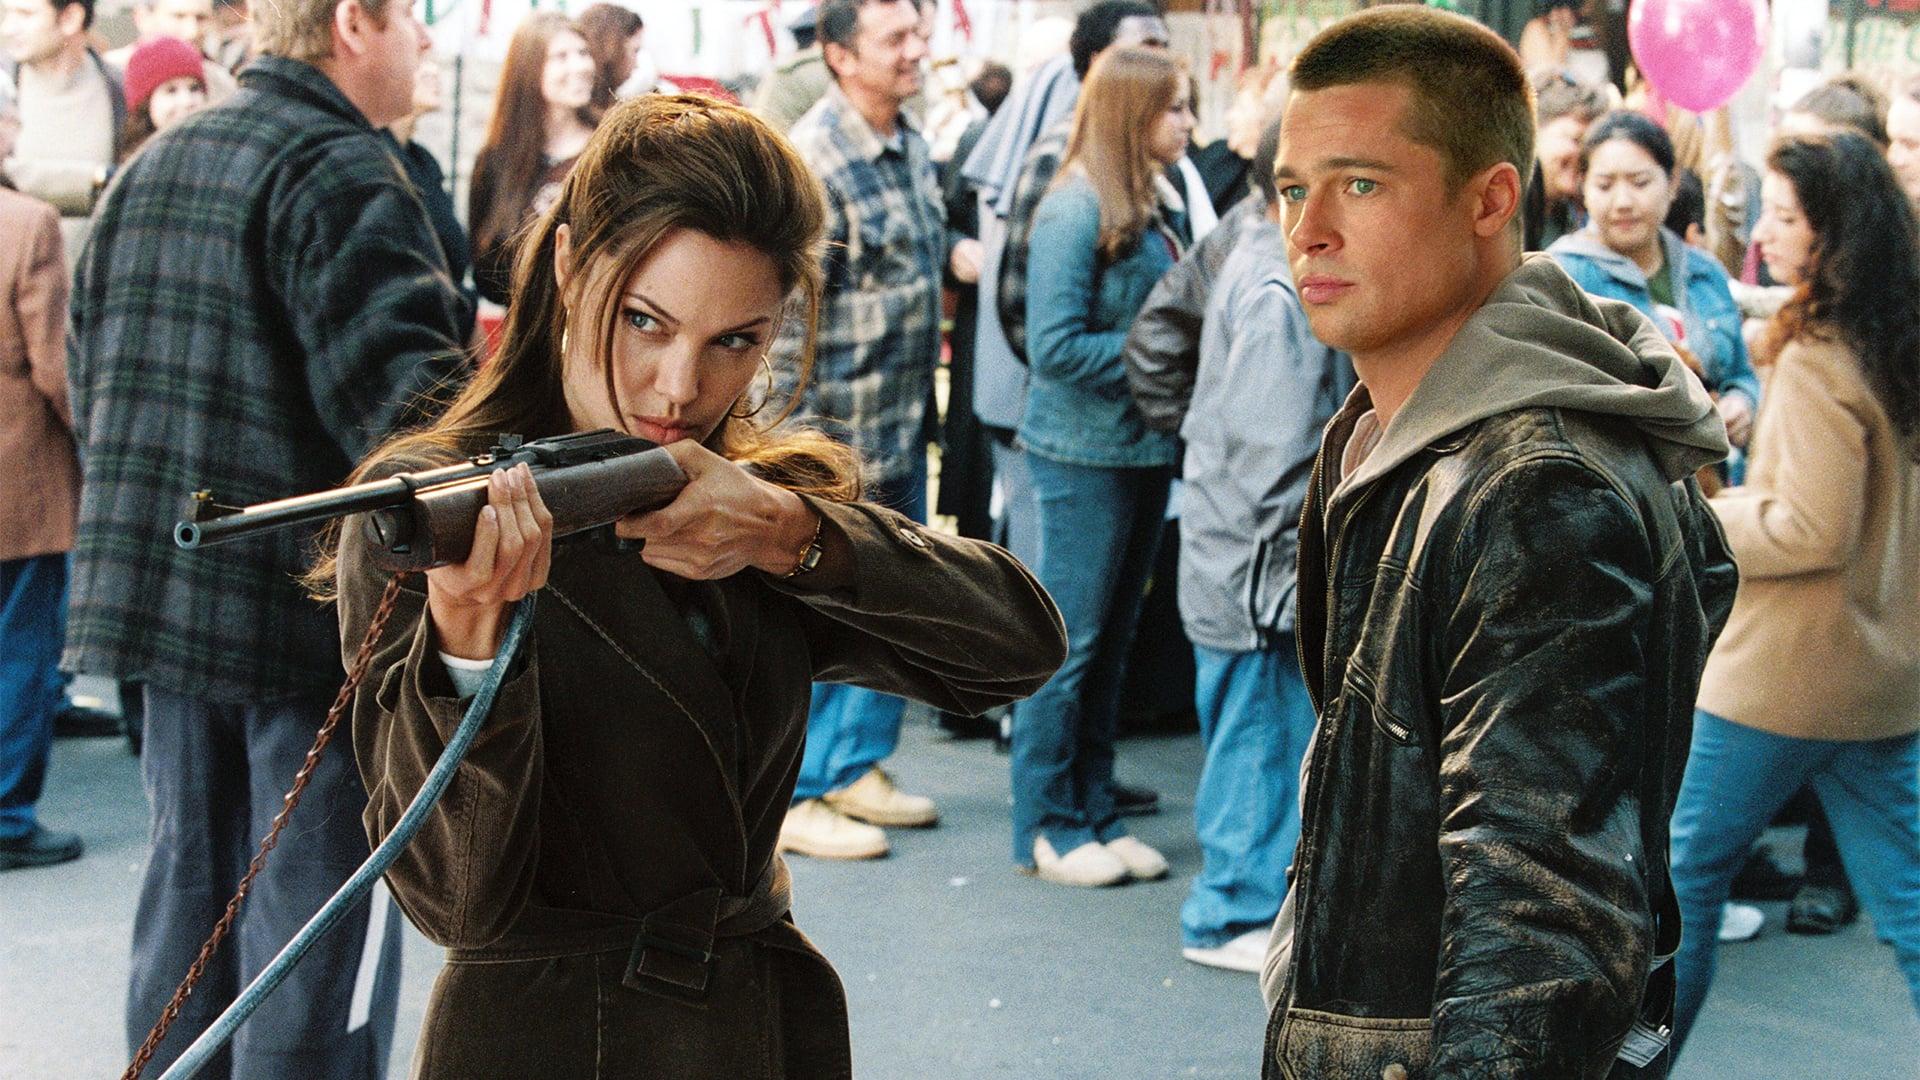 Mr. & Mrs. Smith : นายและนางคู่พิฆาต